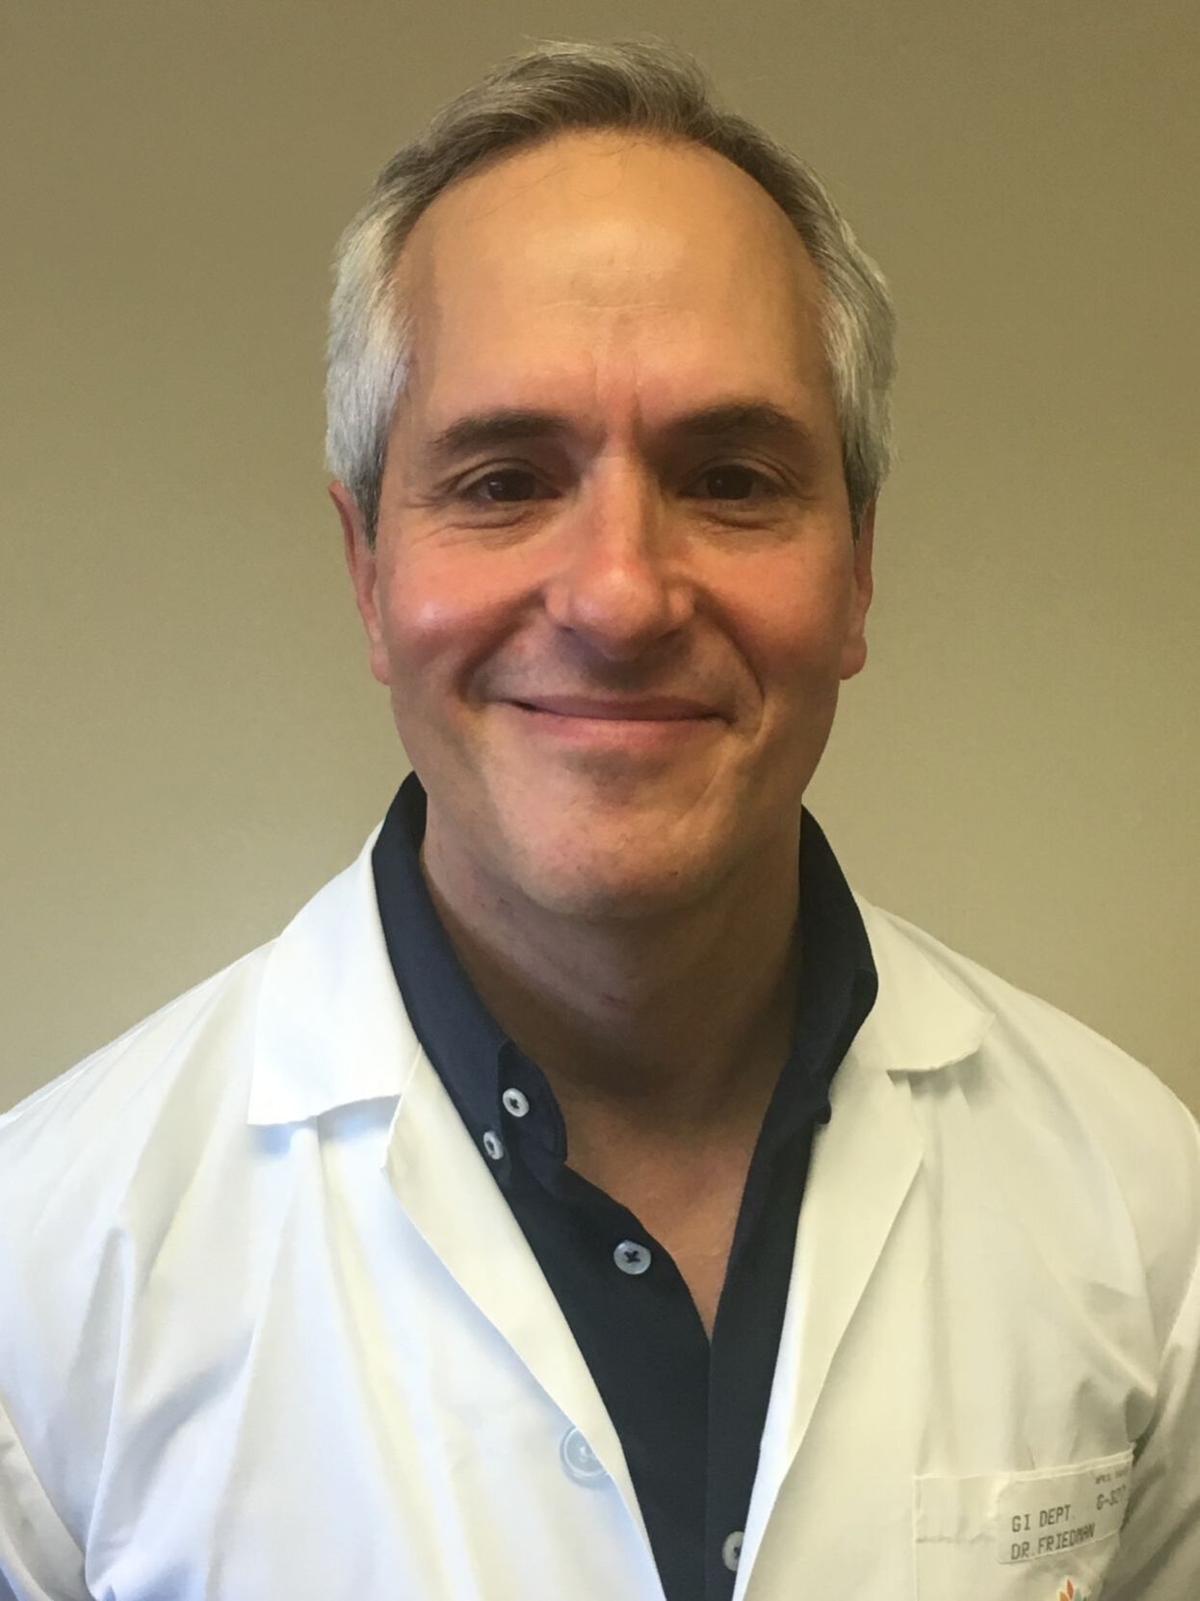 Dr. Gad Friedman